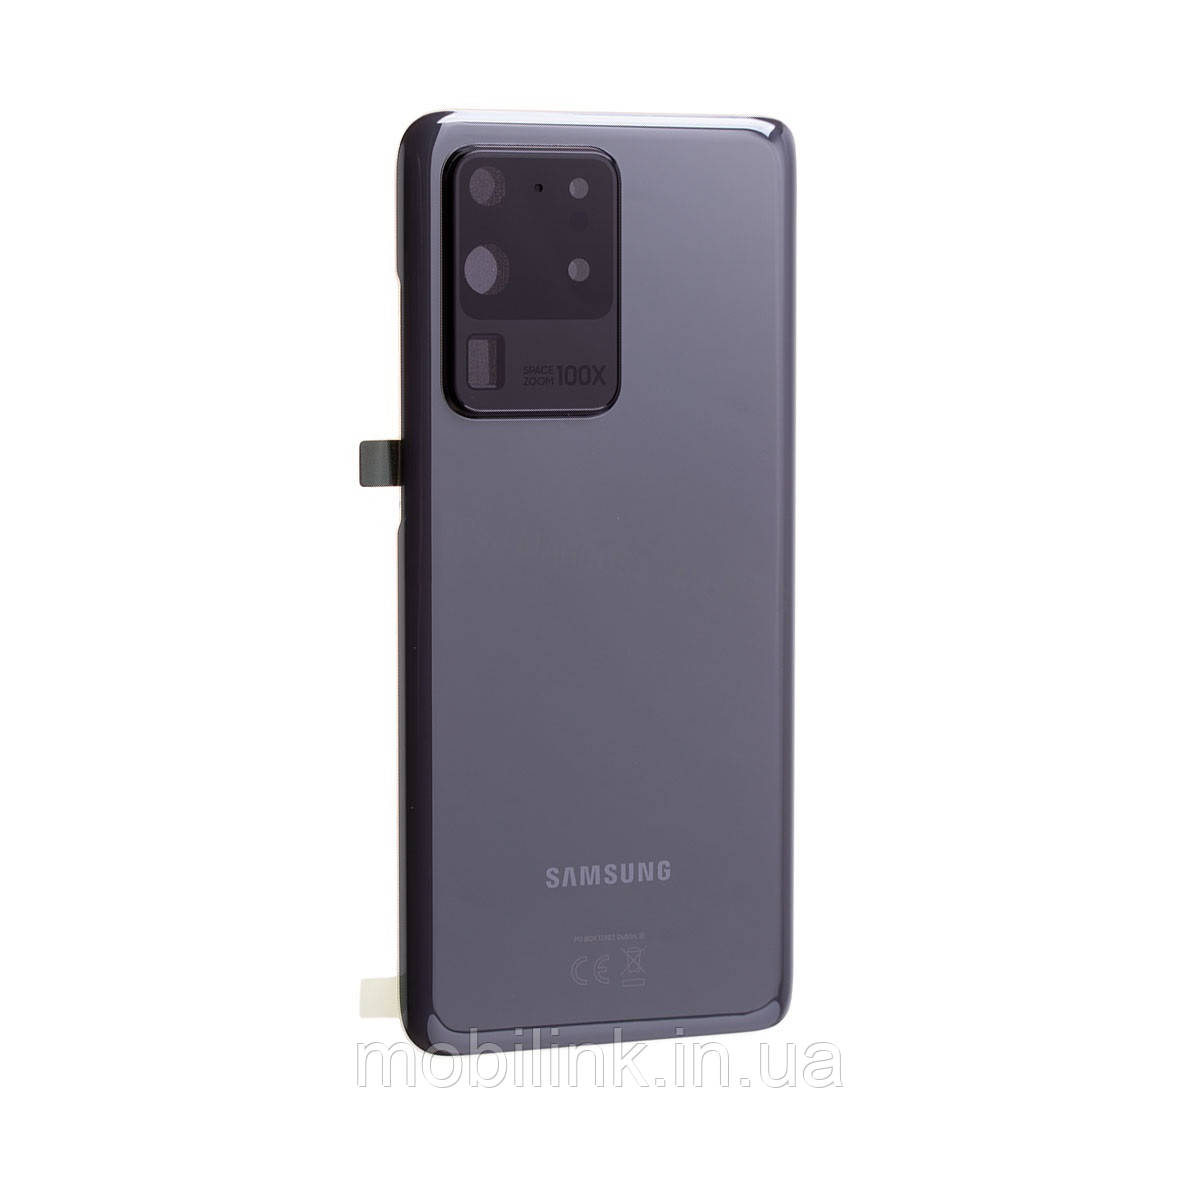 Крышка задняя Samsung SM-G988 Galaxy S20 Ultra,Серая(Cosmic Grey), GH82-22262B, оригинал!